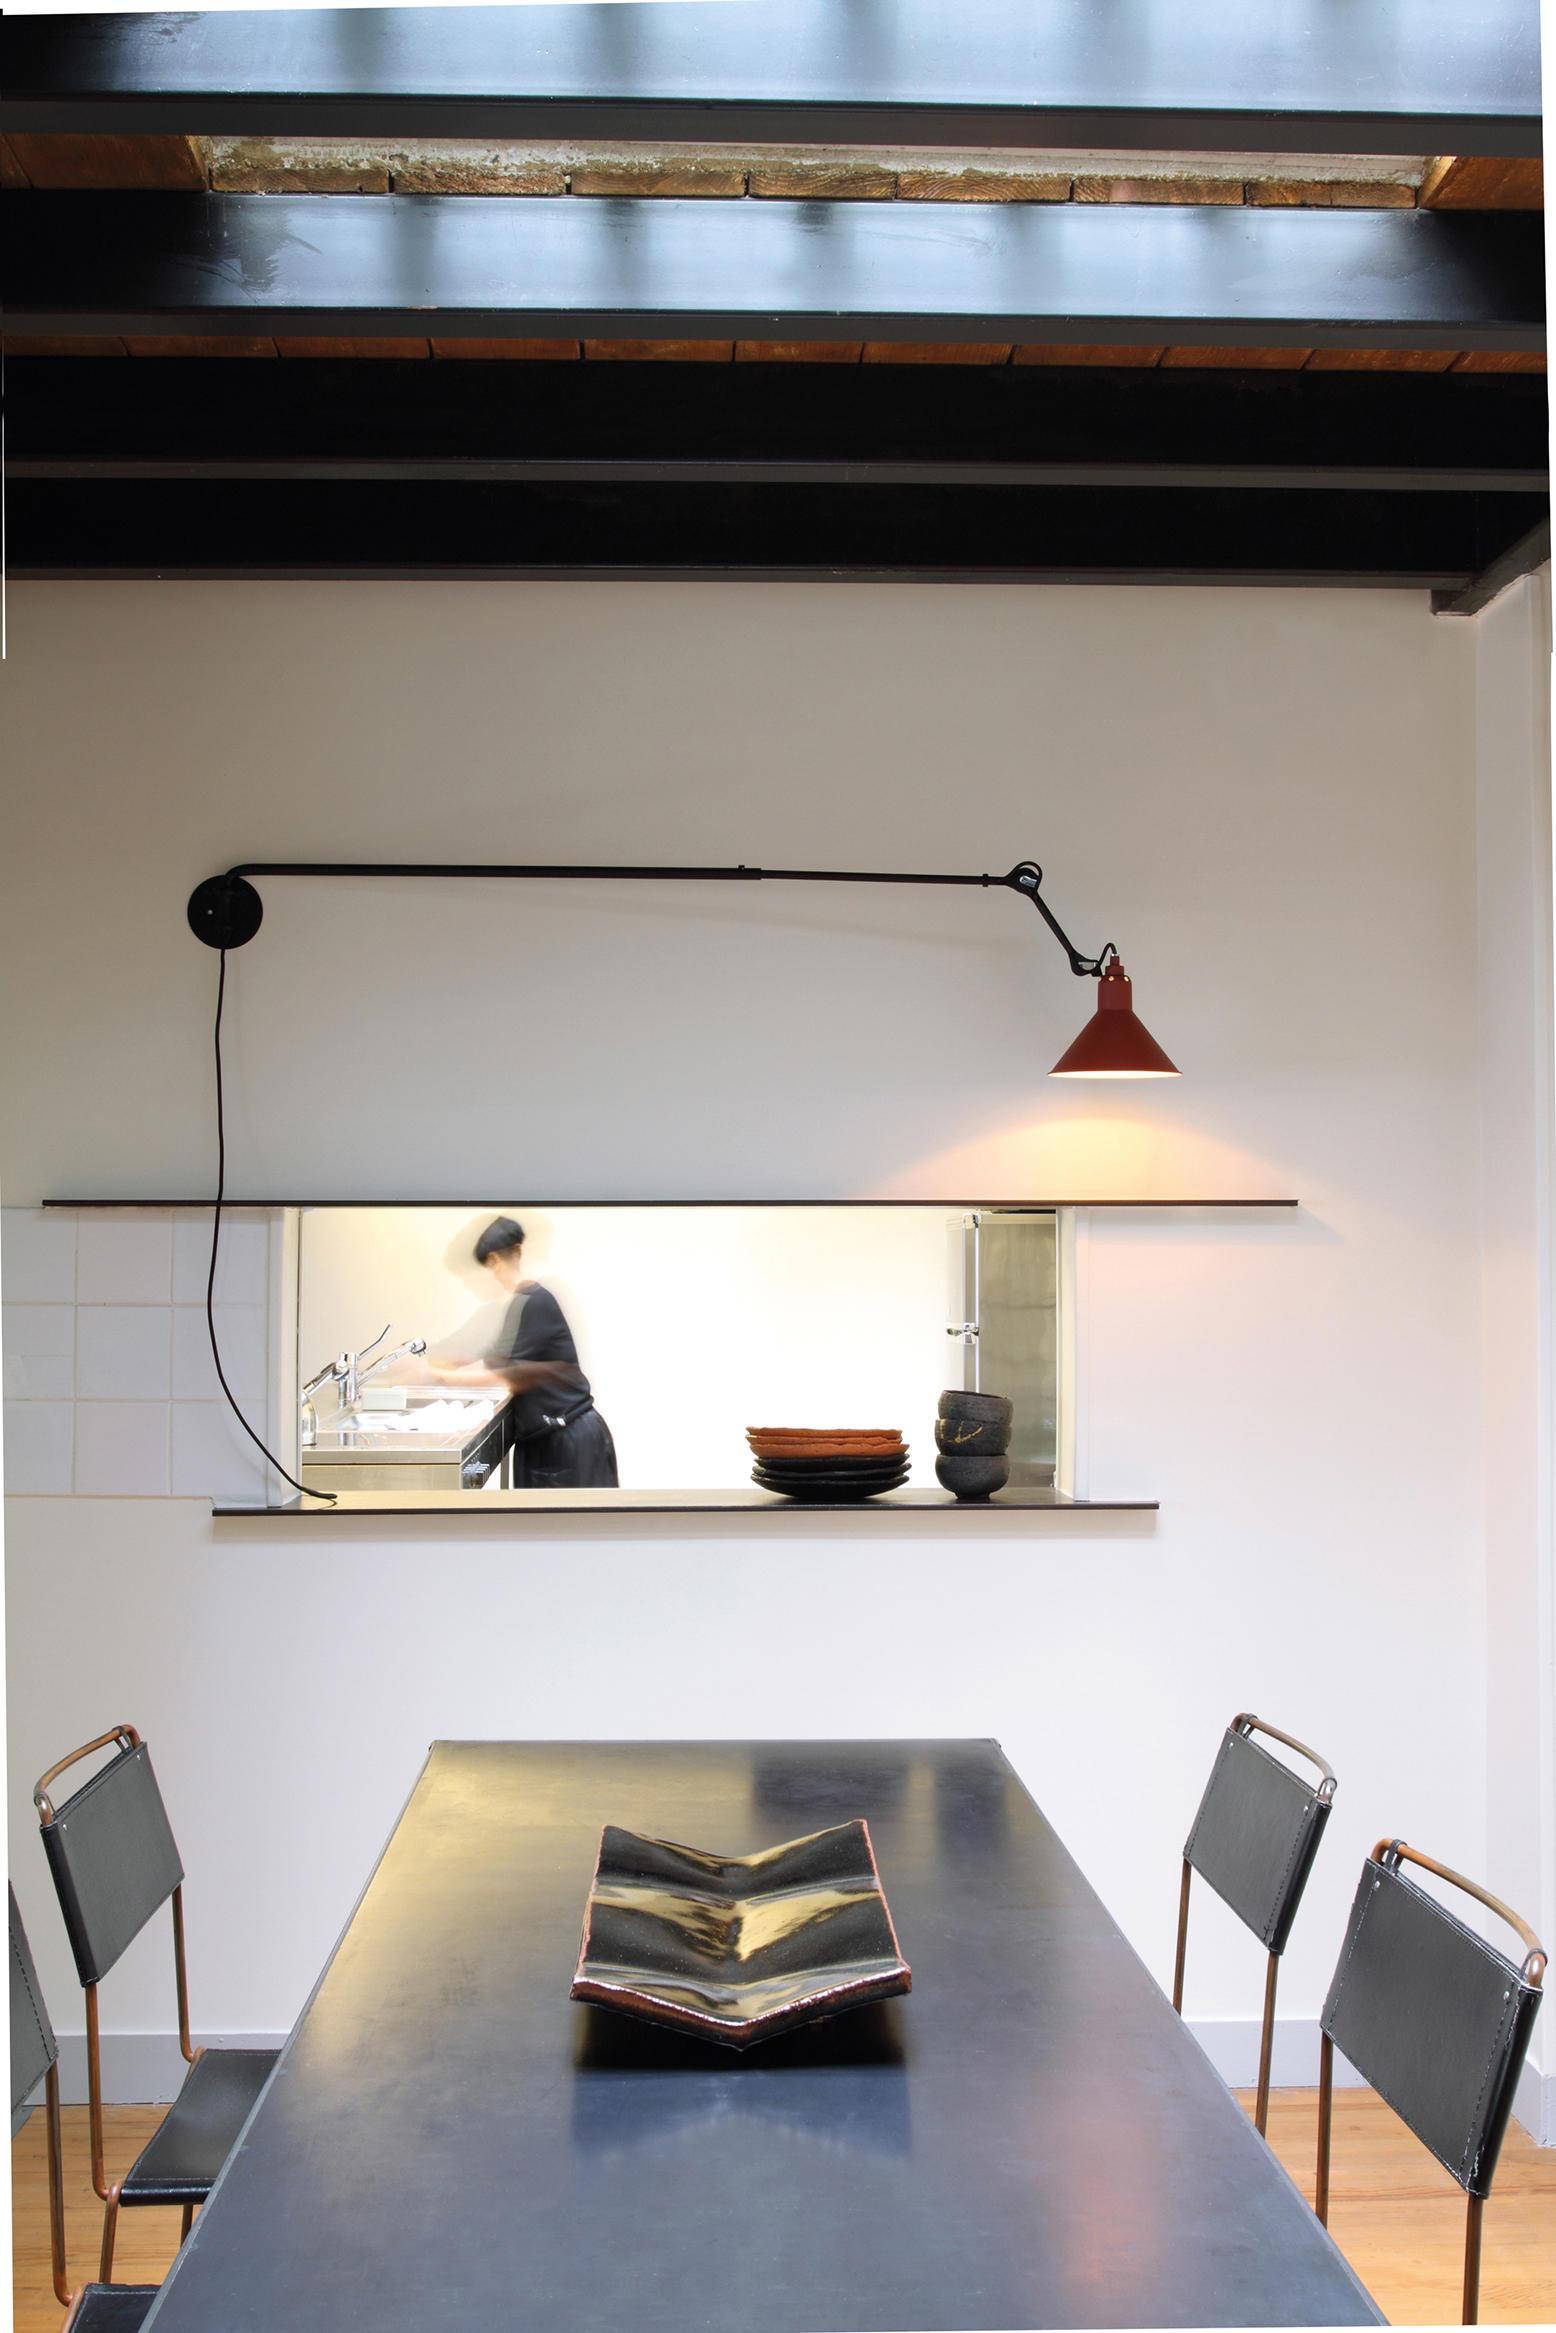 lampe-gras-amb-n213-bl-red-h Faszinierend Up Down Lampe Dekorationen